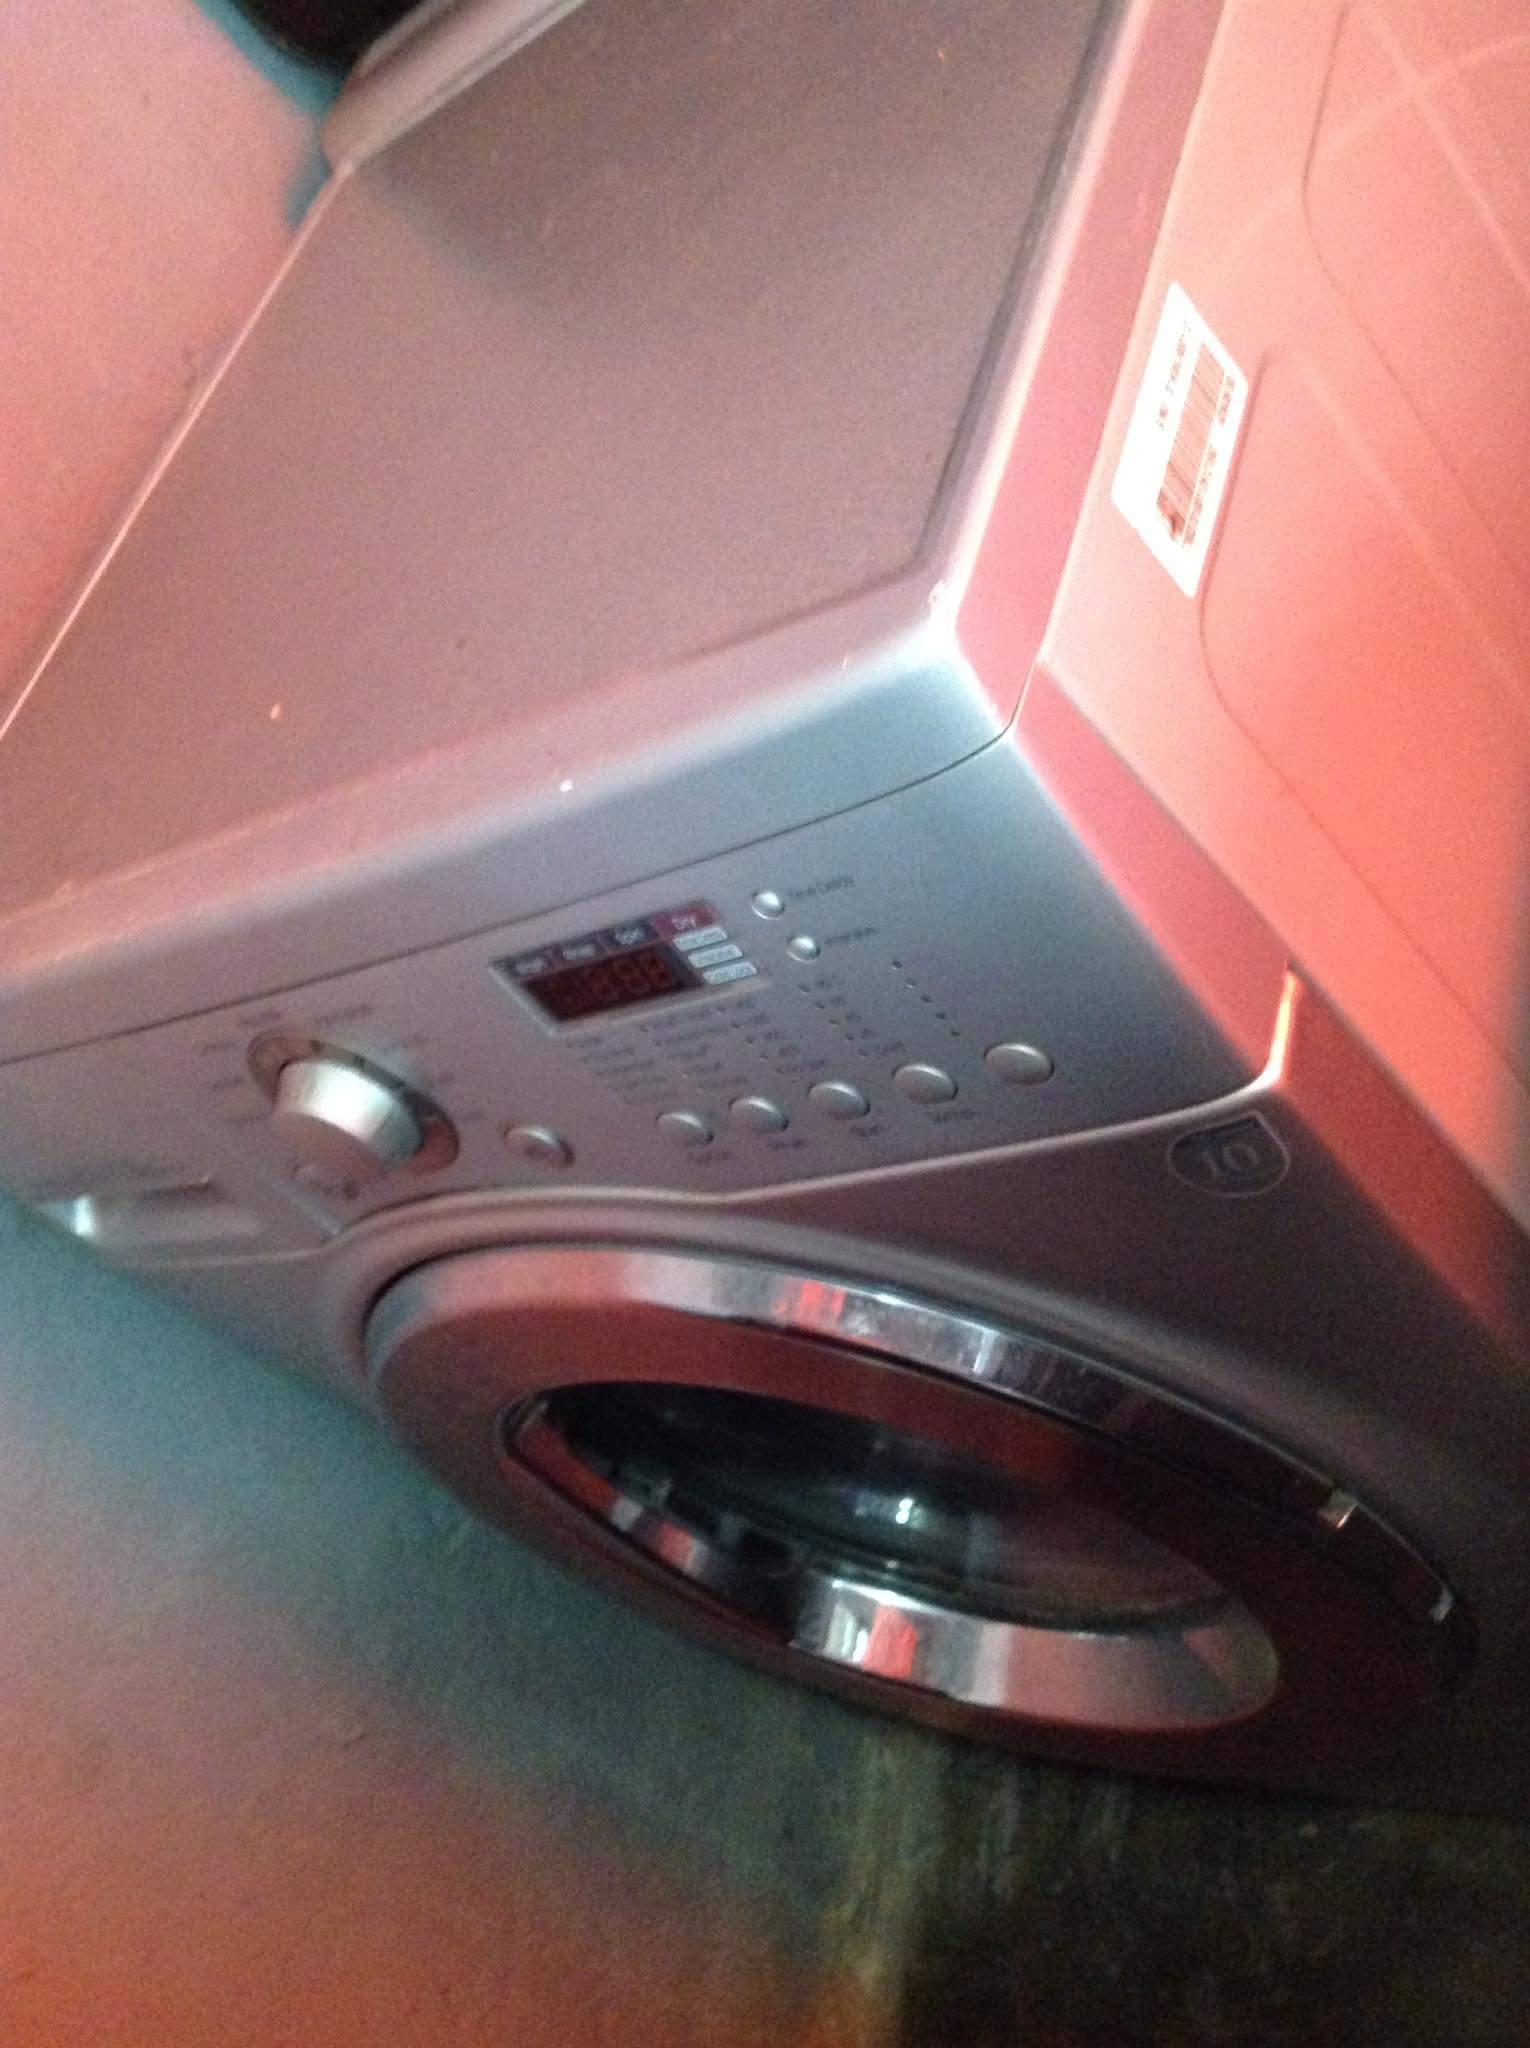 Broken washing machine for sale swop or top up